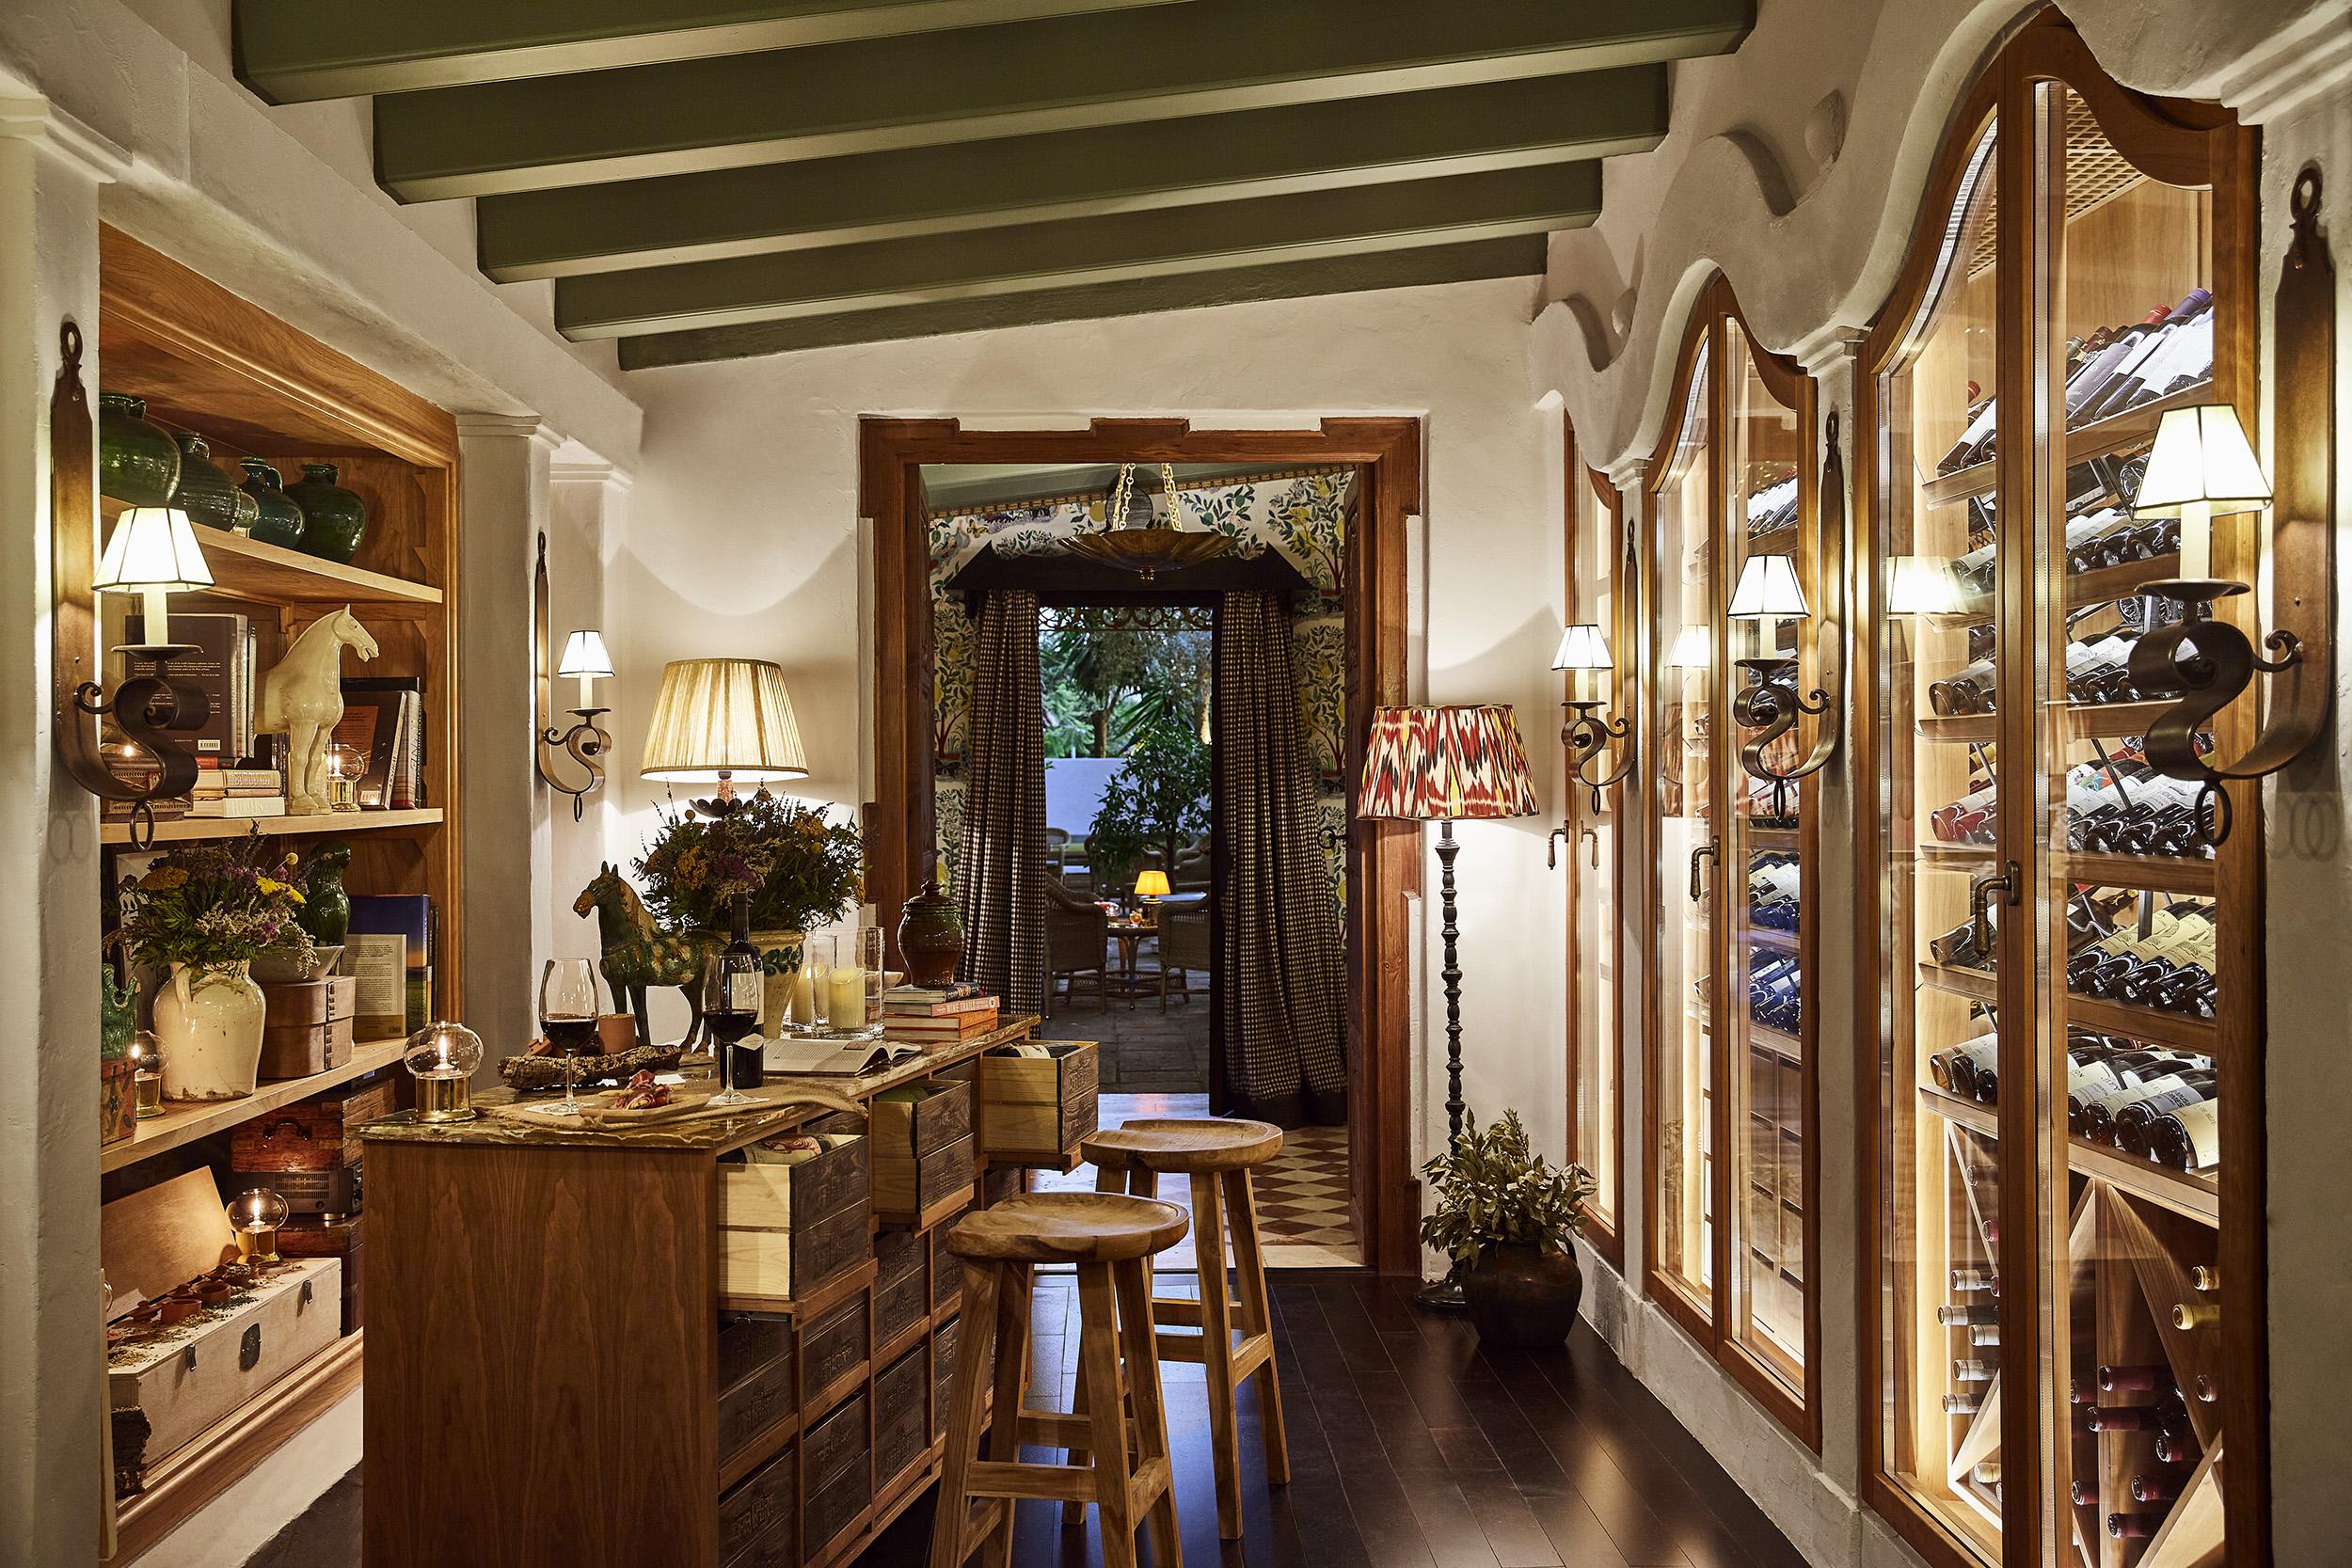 La Bodega shop at Marbella Club Hotel